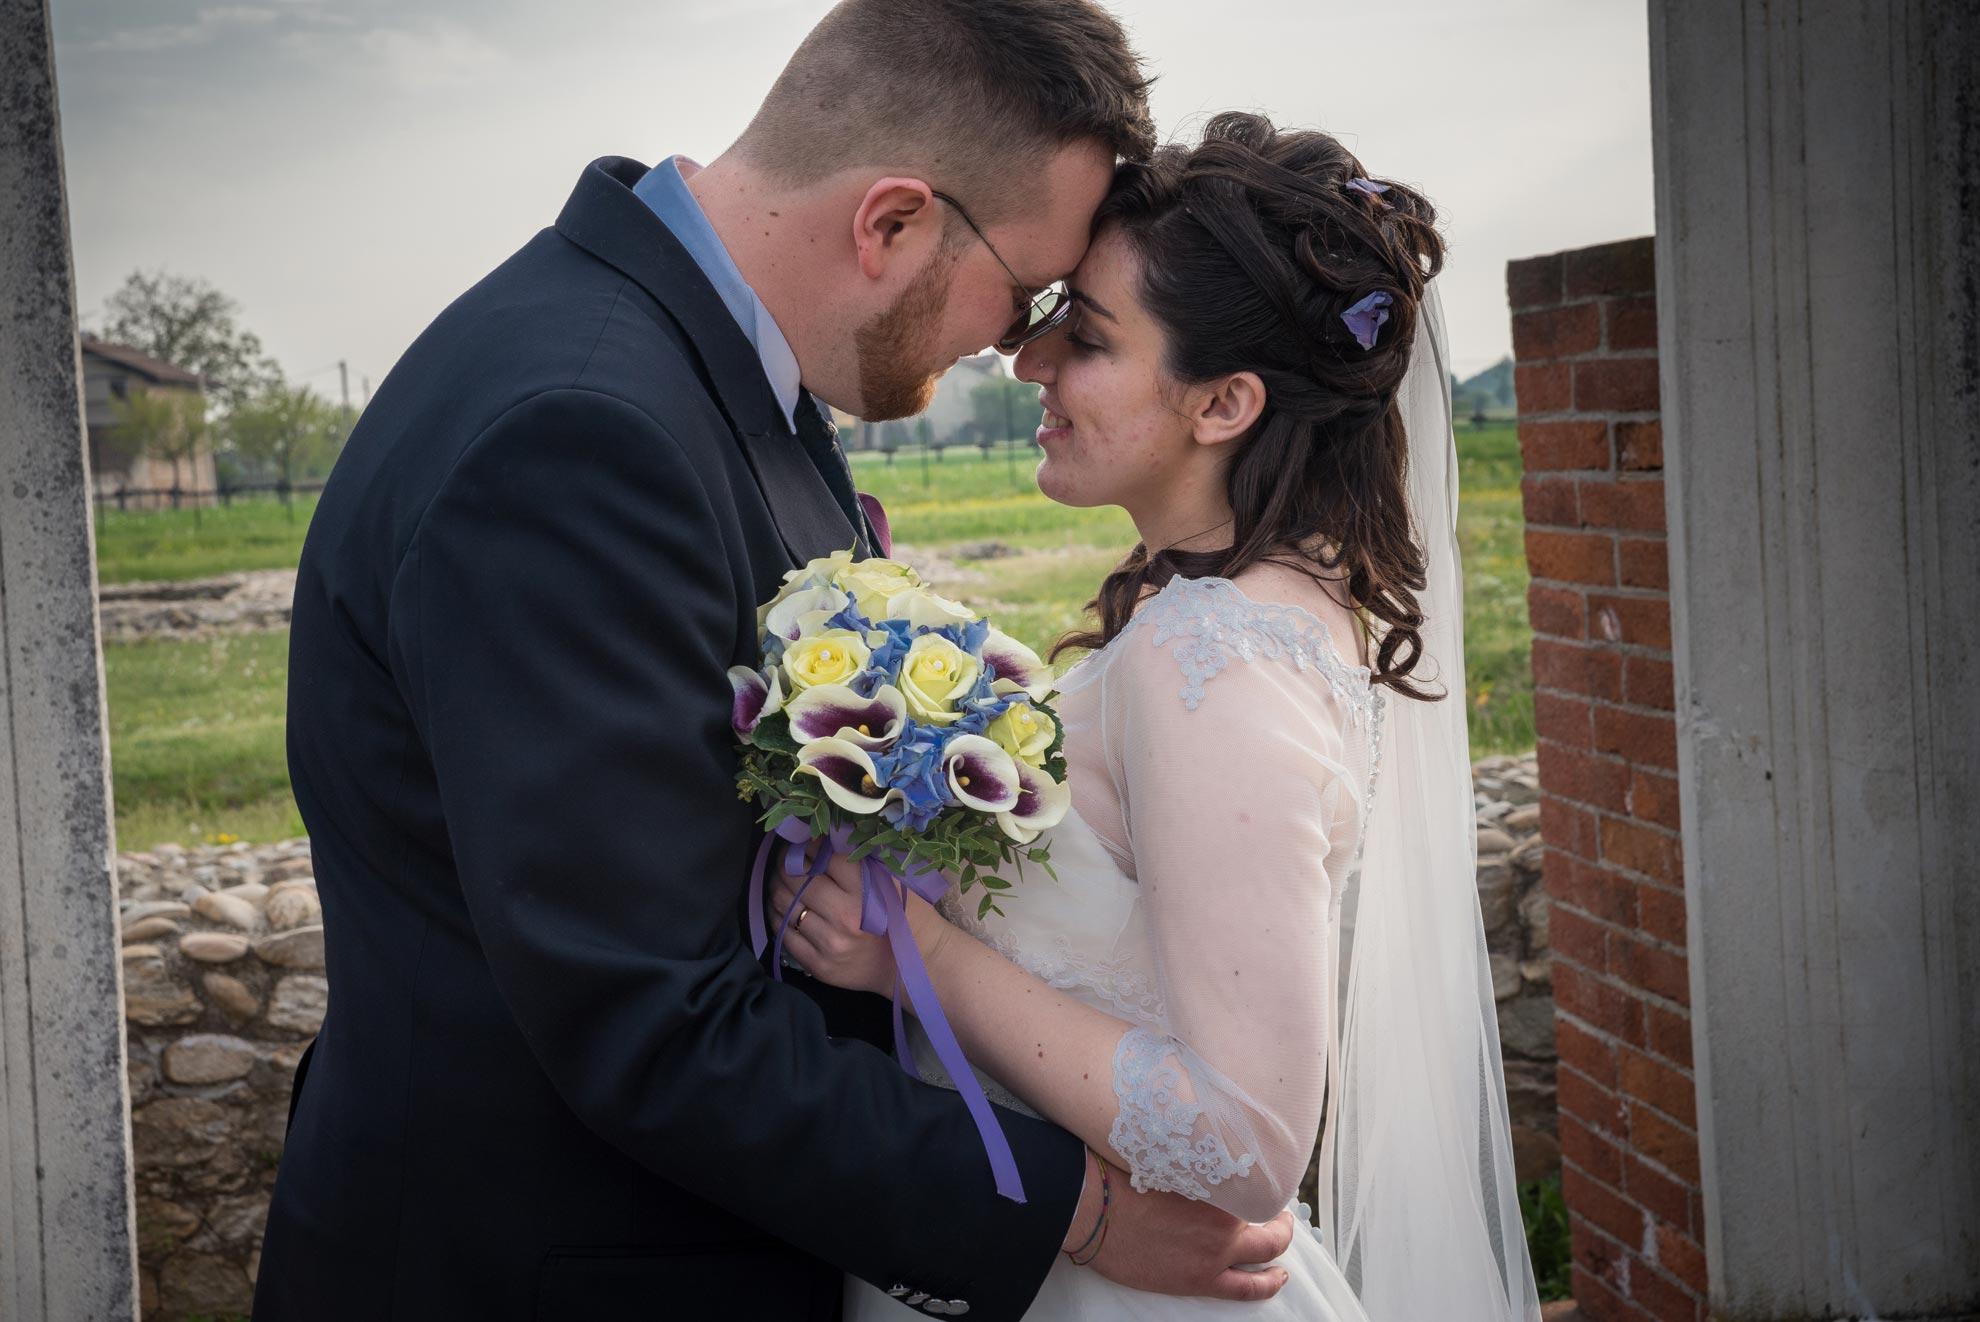 Matrimonio a Narzole Lorenza Diego - DSC 3197 - Fotografie matrimonio con buchè - Fotografie matrimonio con buchè